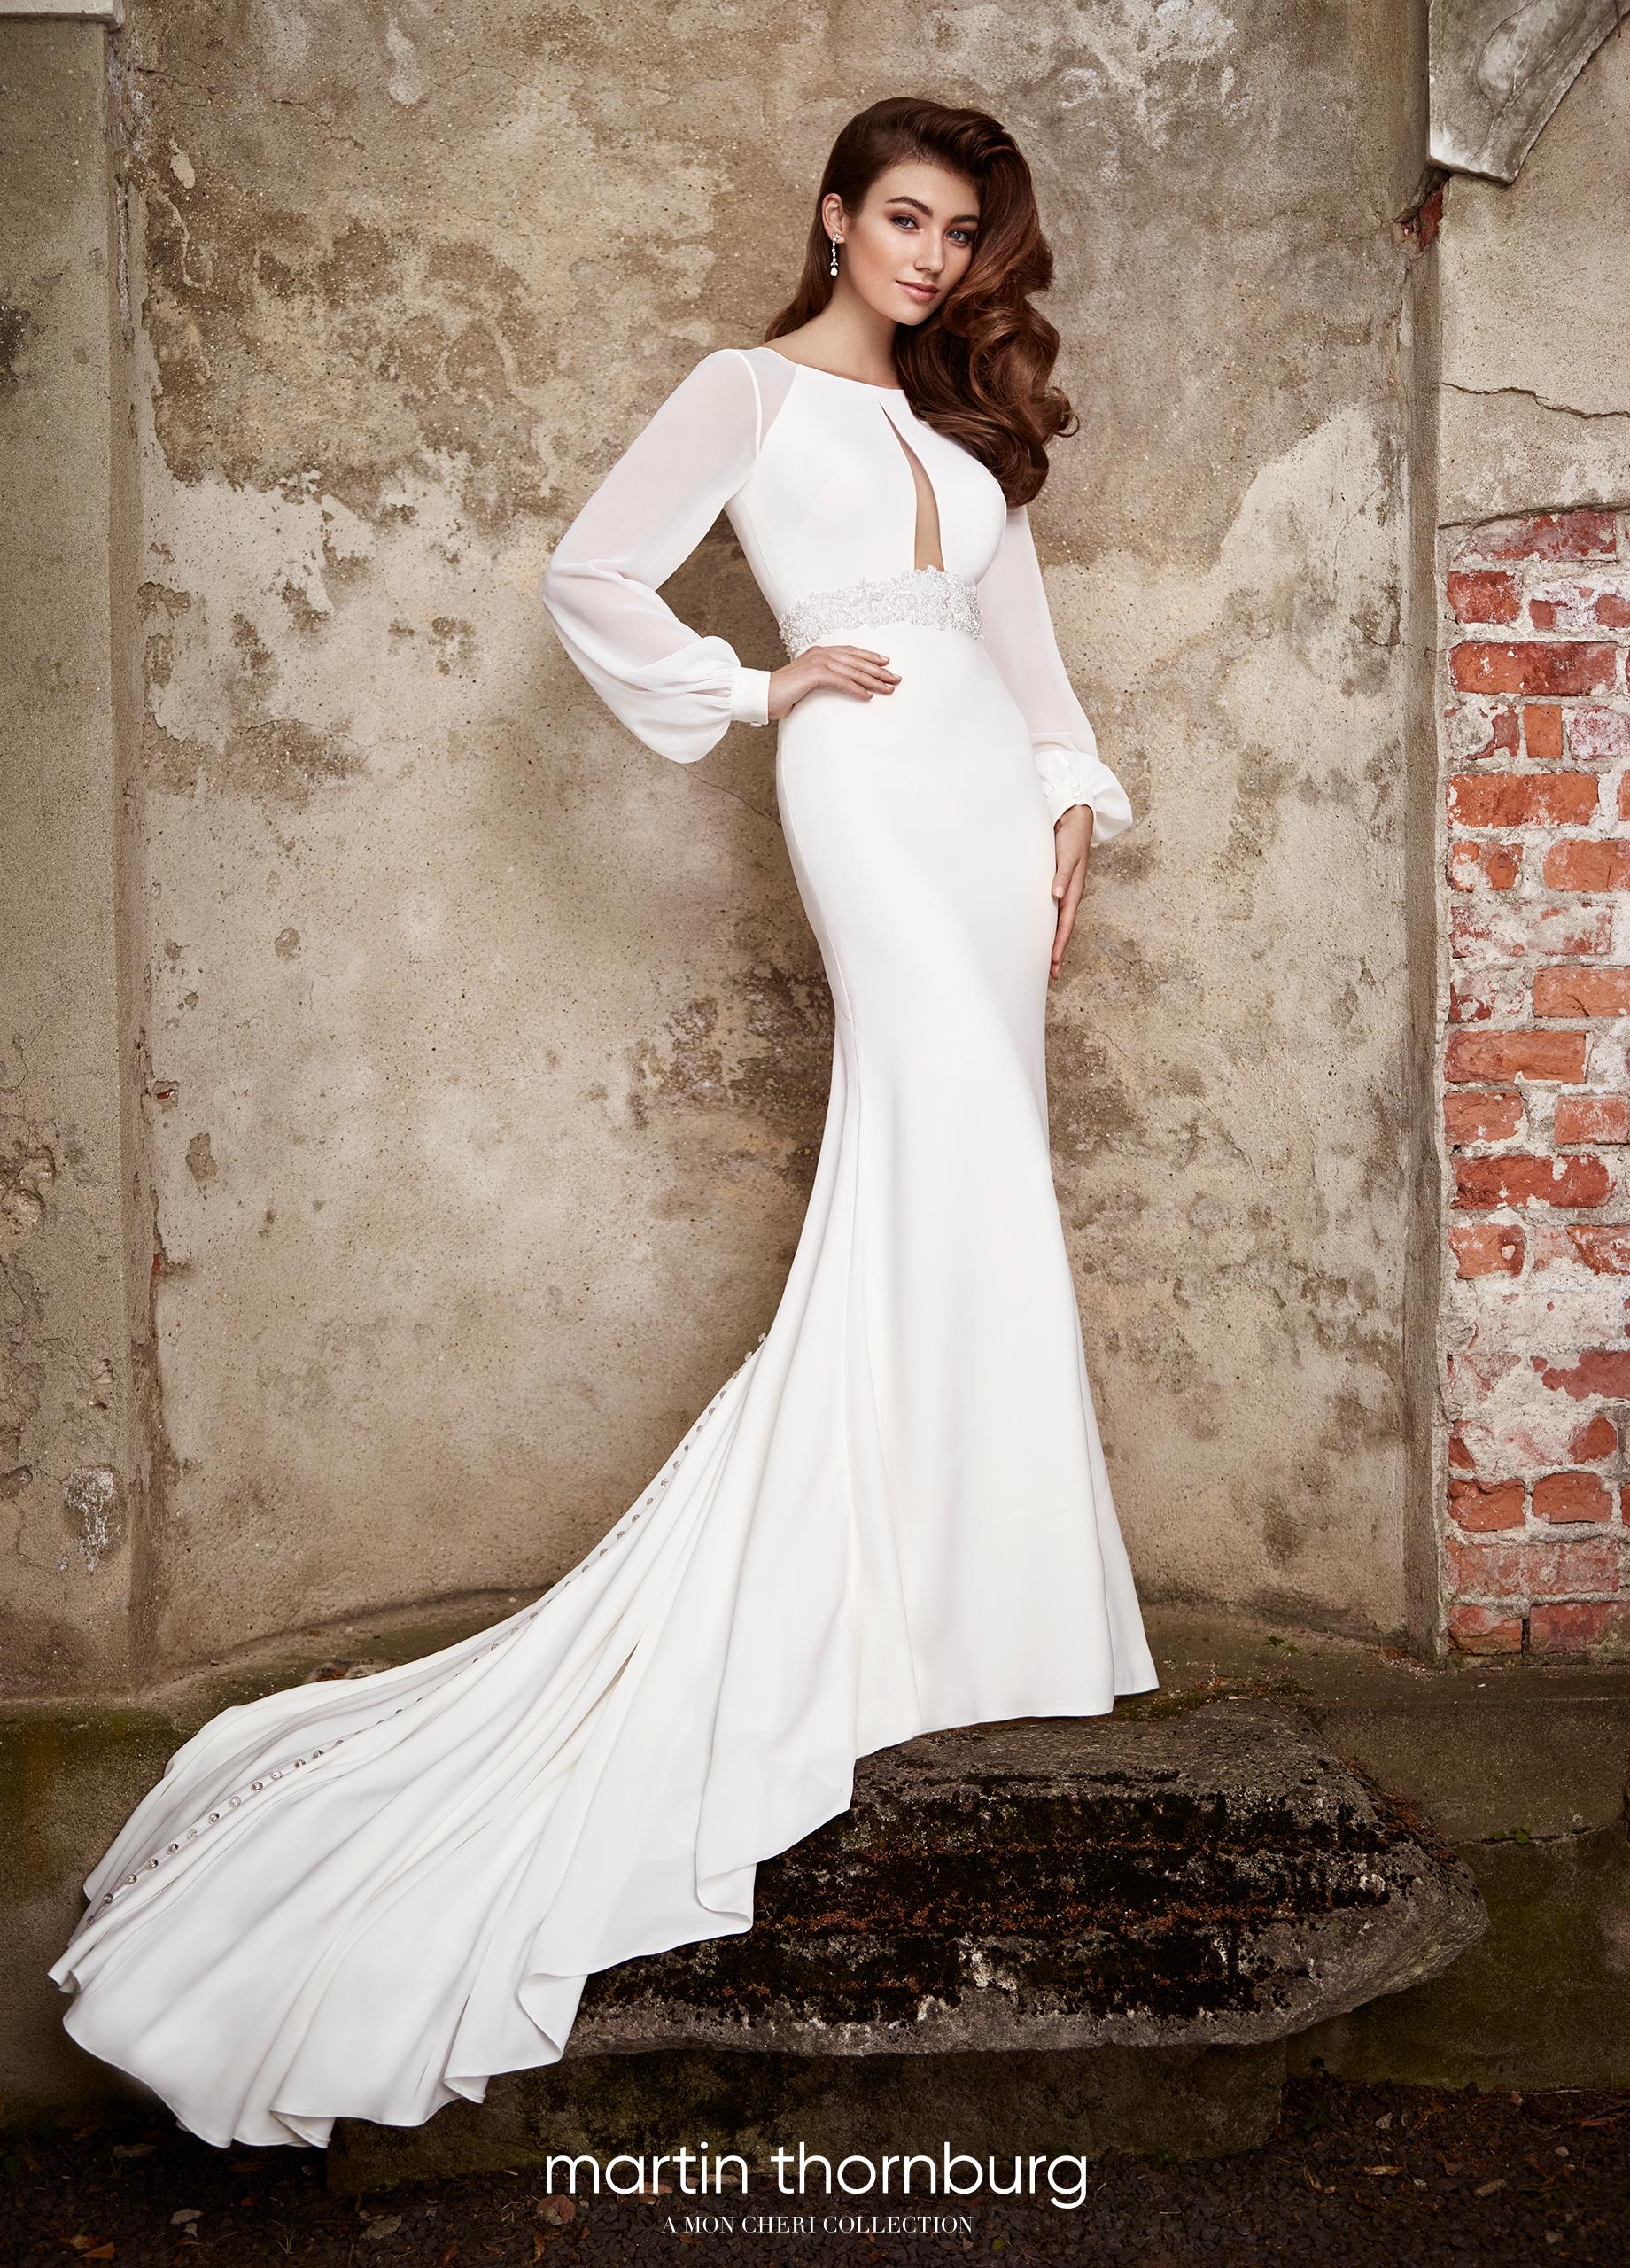 491ba19b8ad Ίσιο χυτό νυφικό φόρεμα κρεπ σιφόν μακρυά μανίκια 119282Α VENETTI